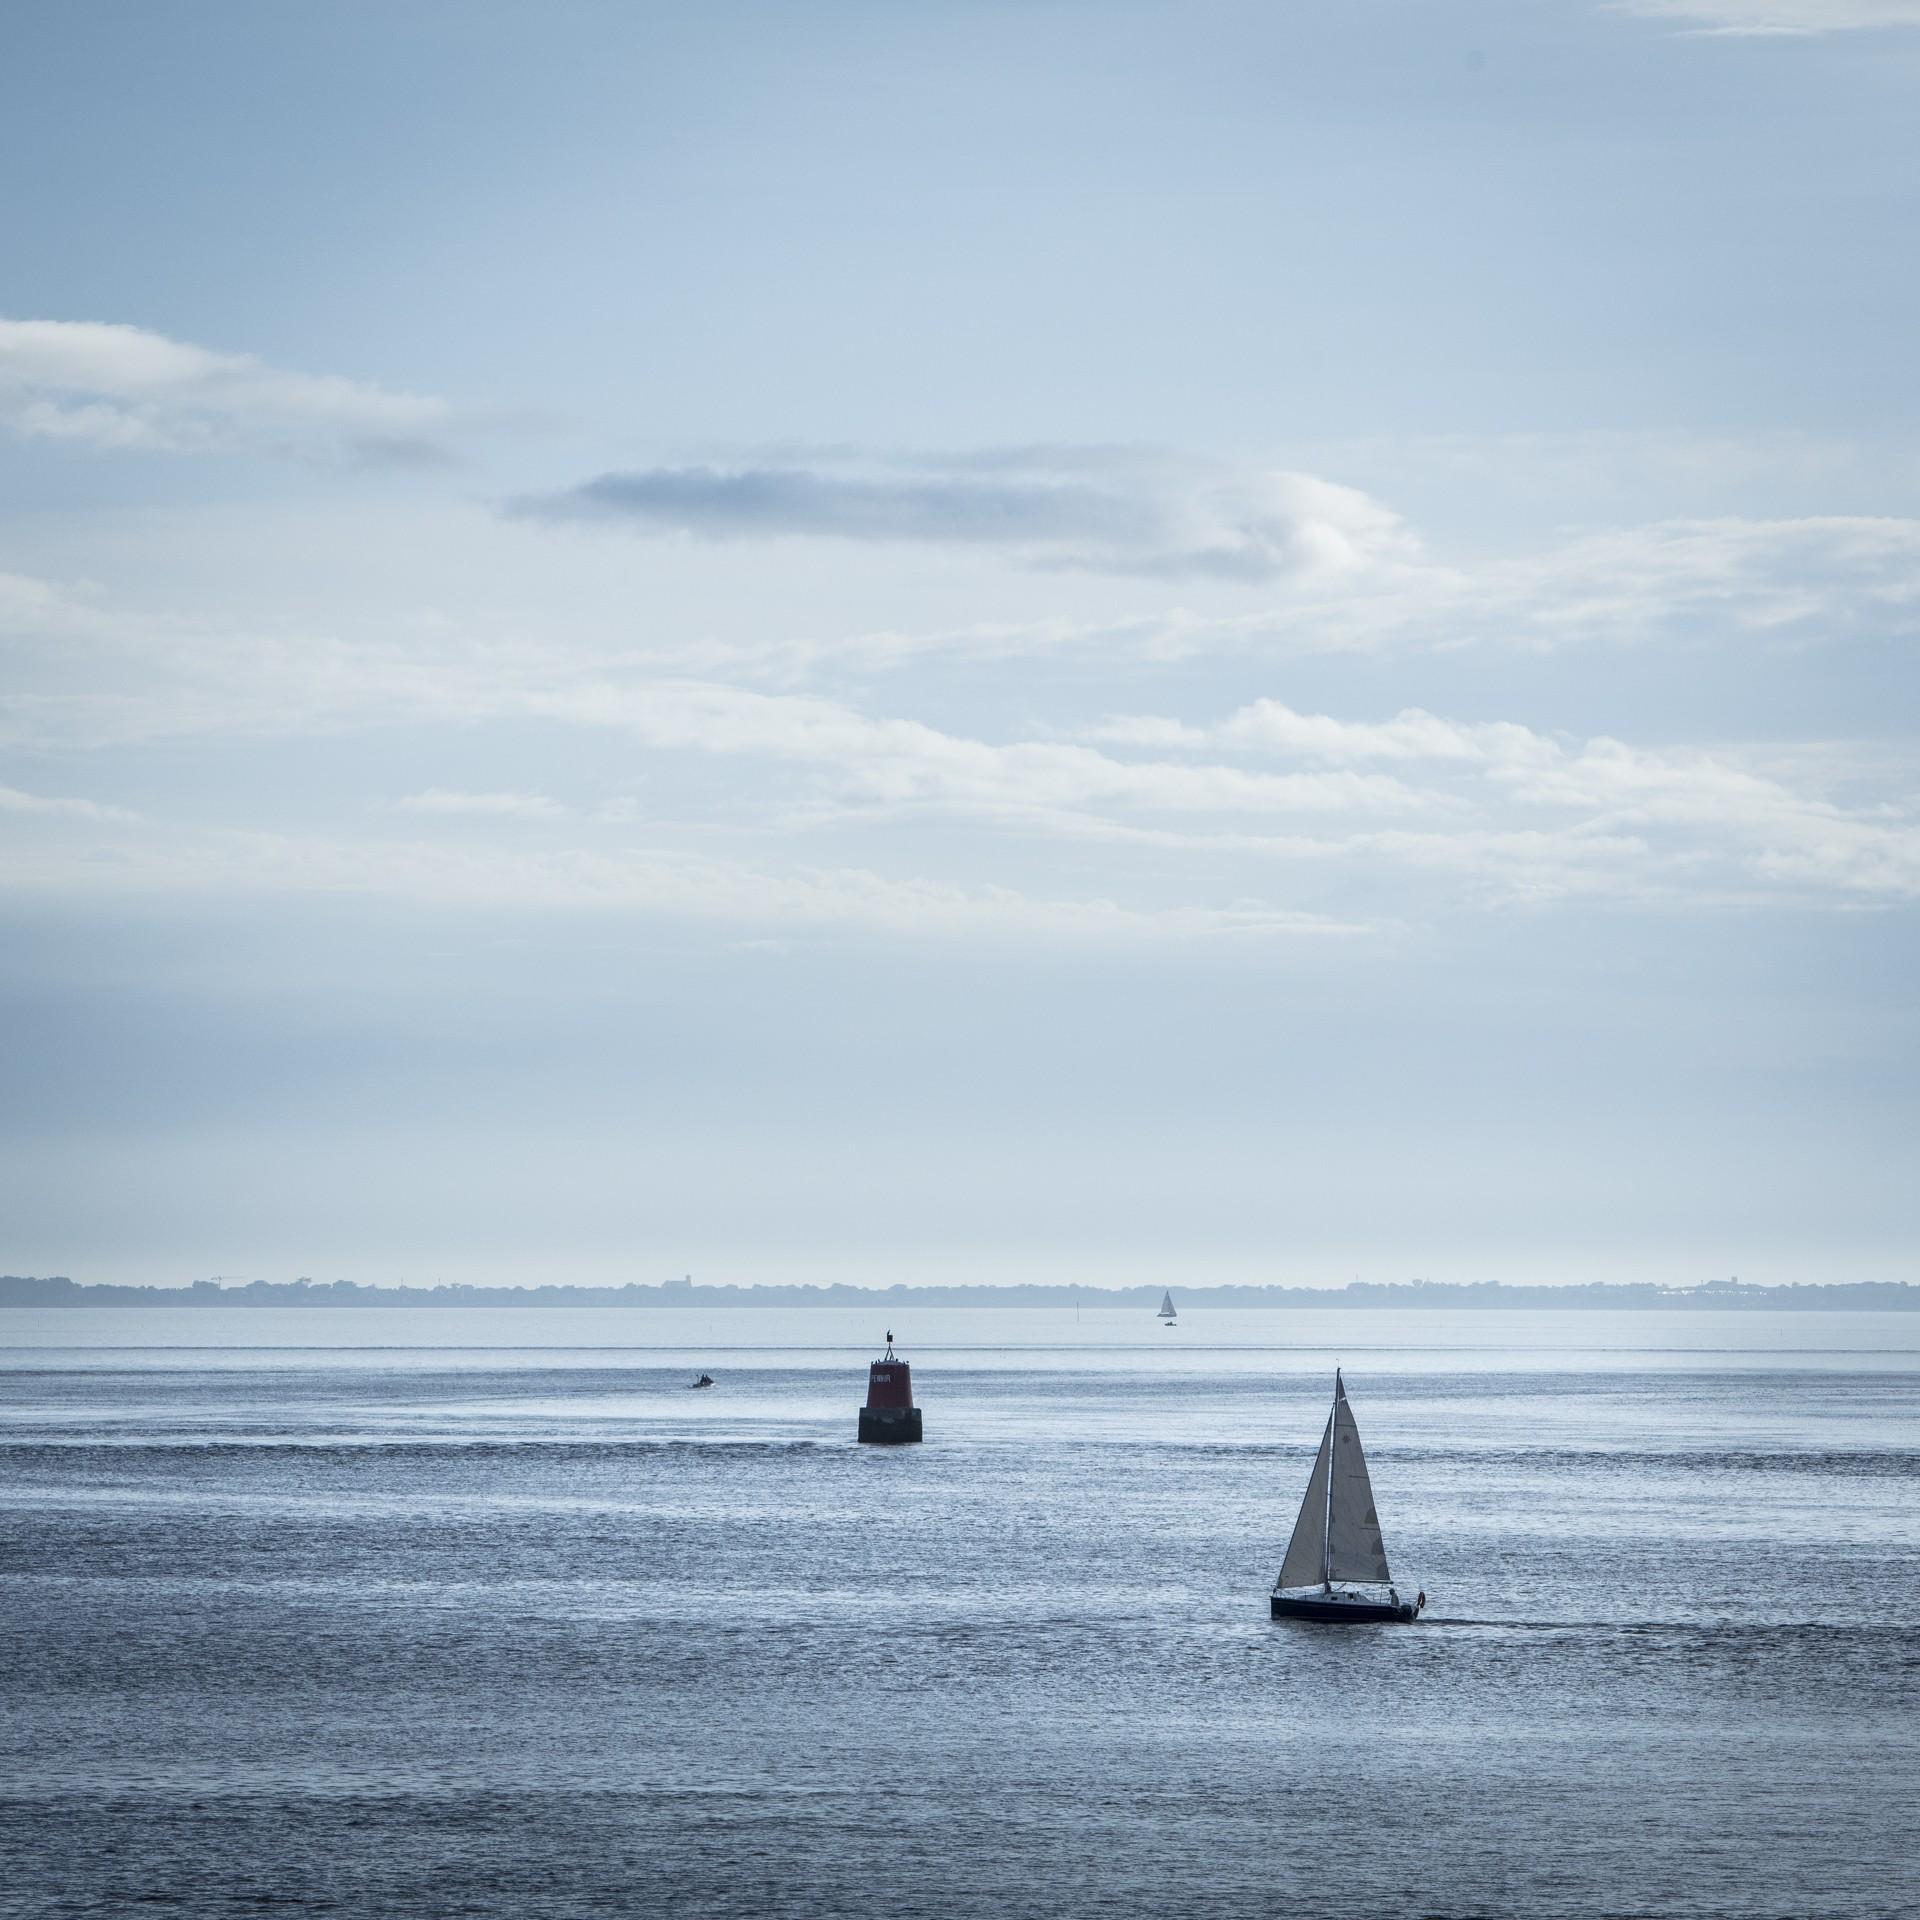 Barre d'Etel #3 - Morbihan - Août 2020